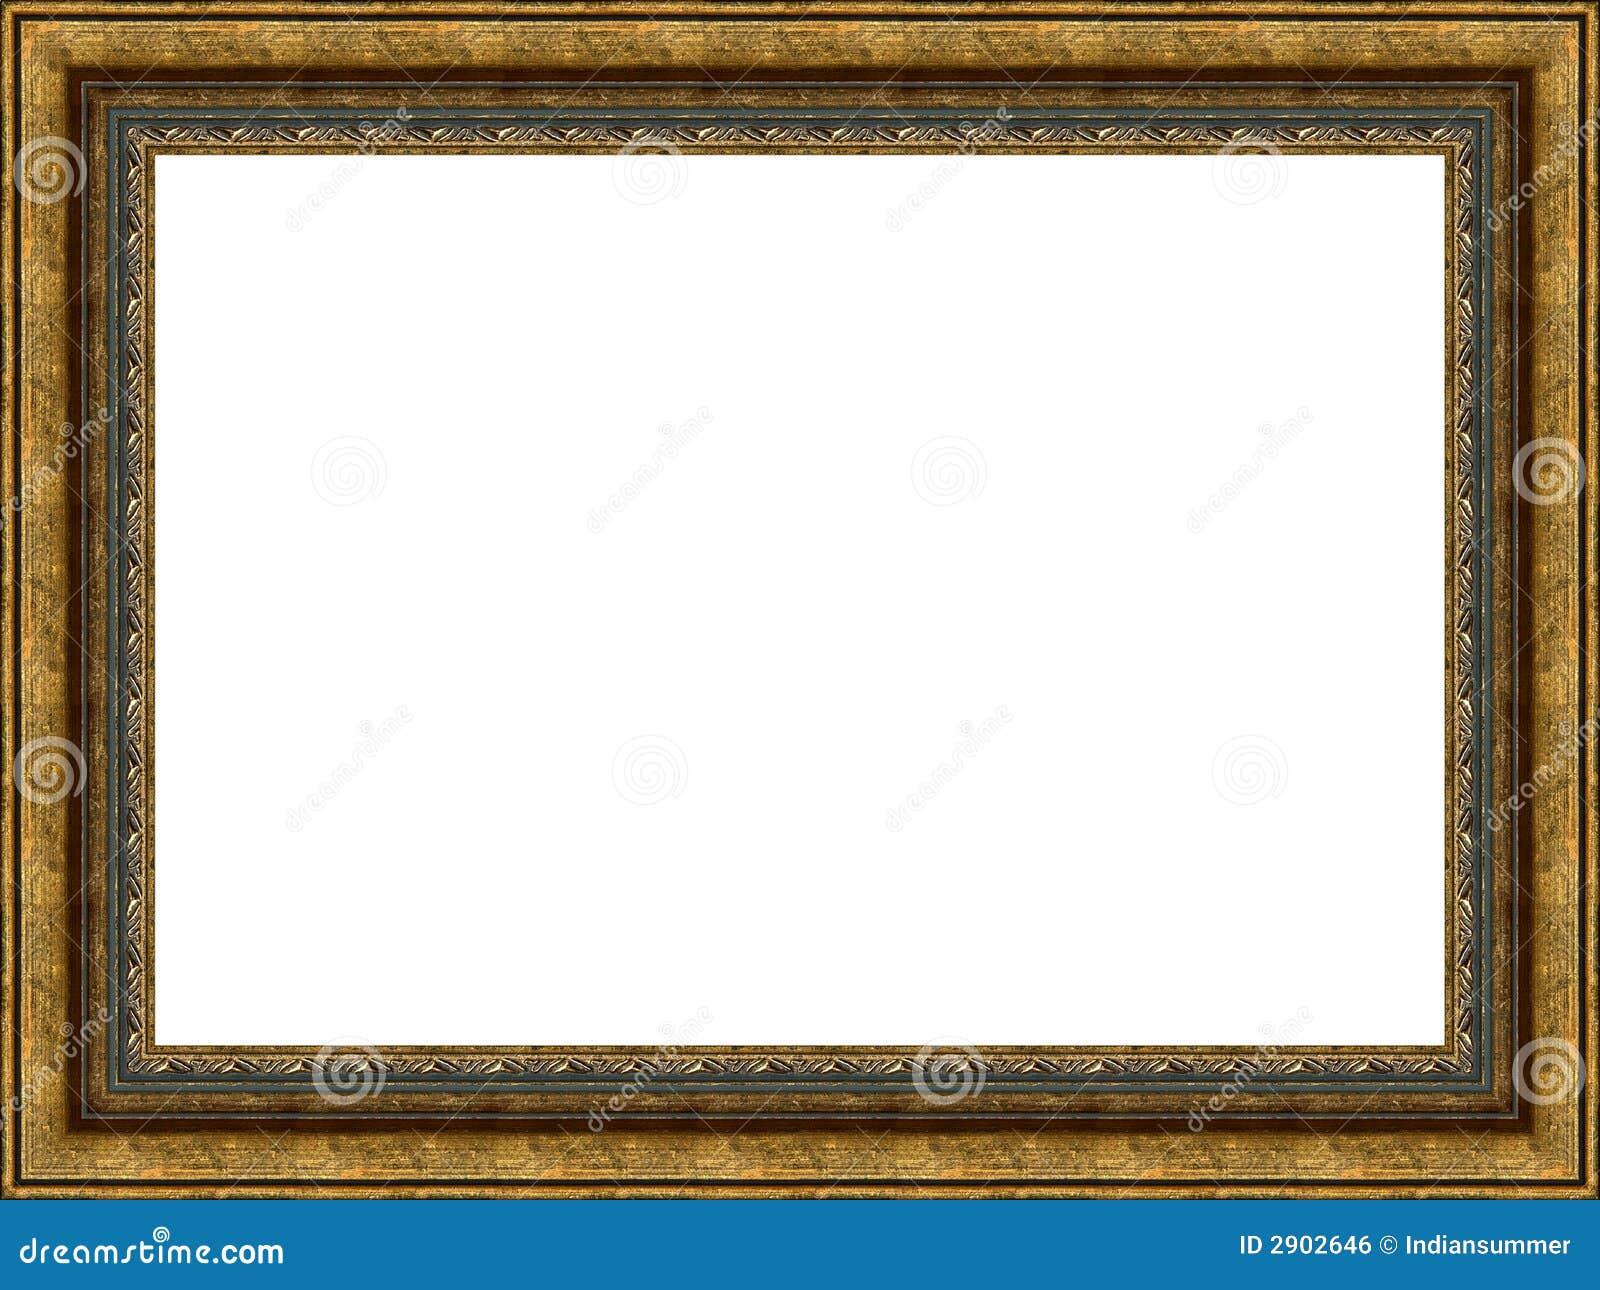 Old Fashioned Photo Frames Photoshop